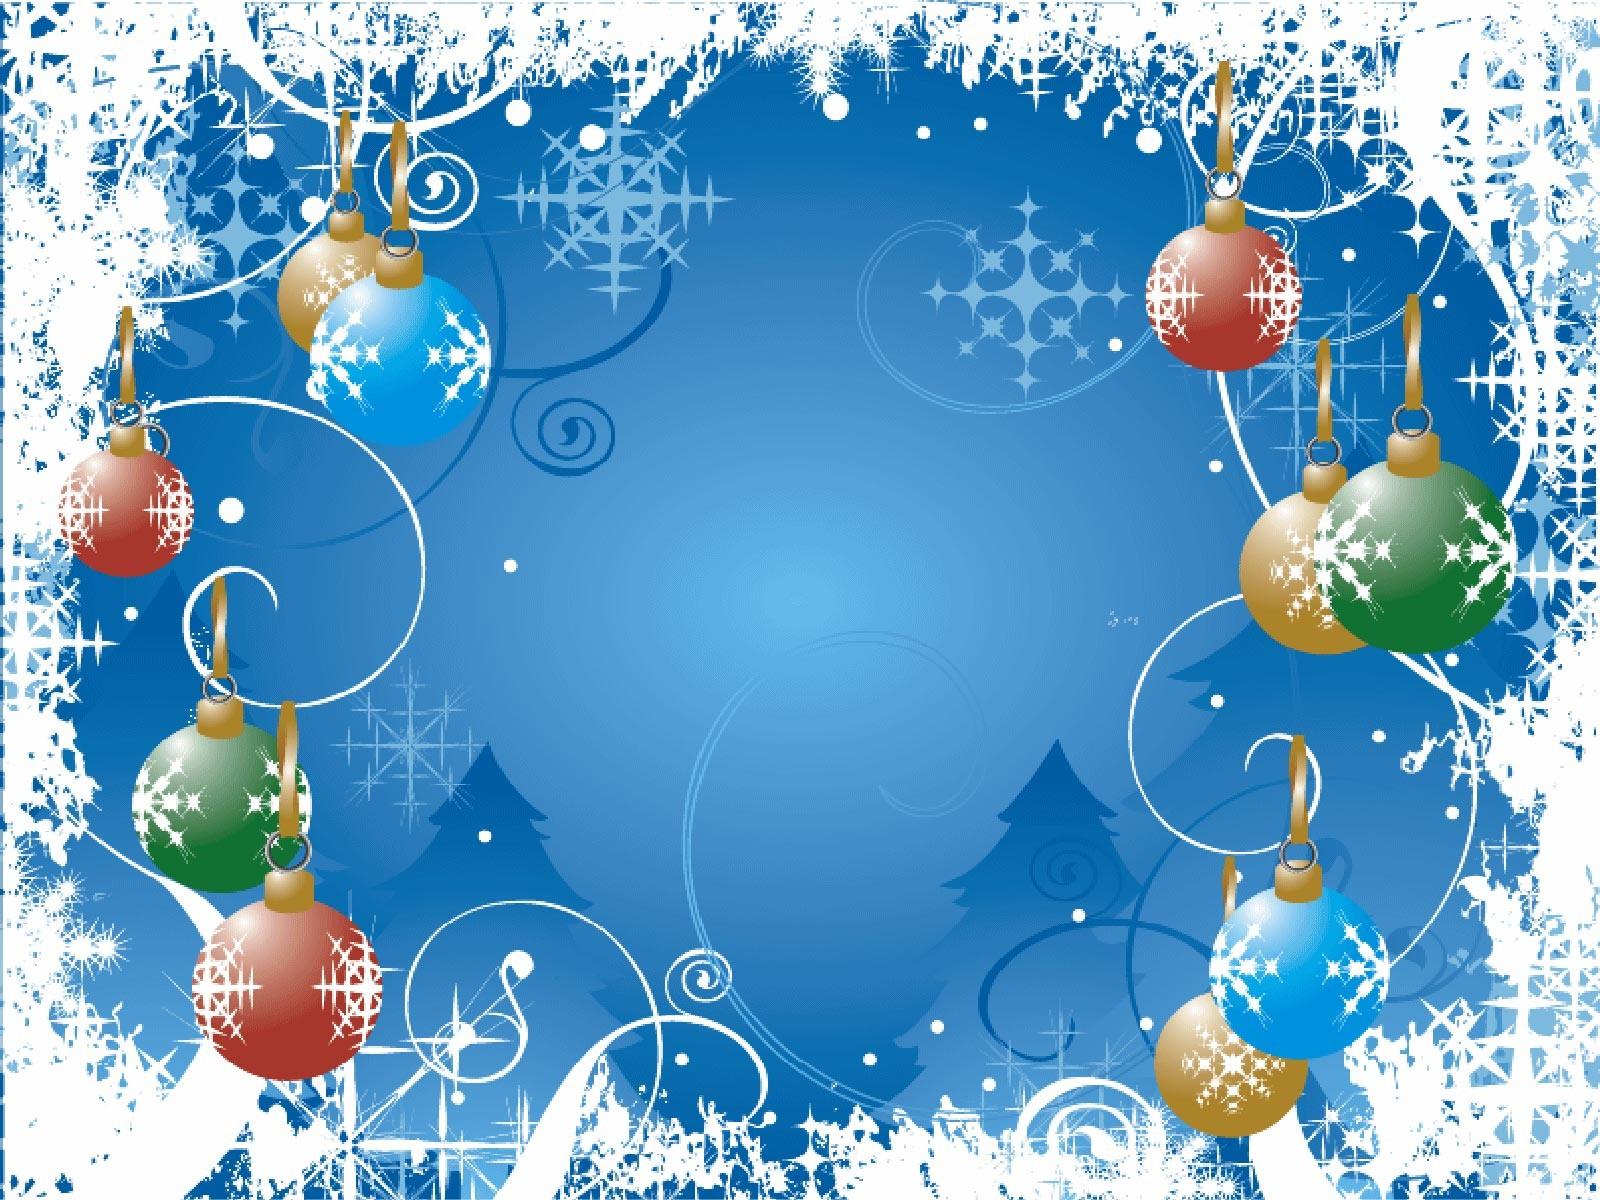 Winter Holiday desktop wallpaper 1600x1200